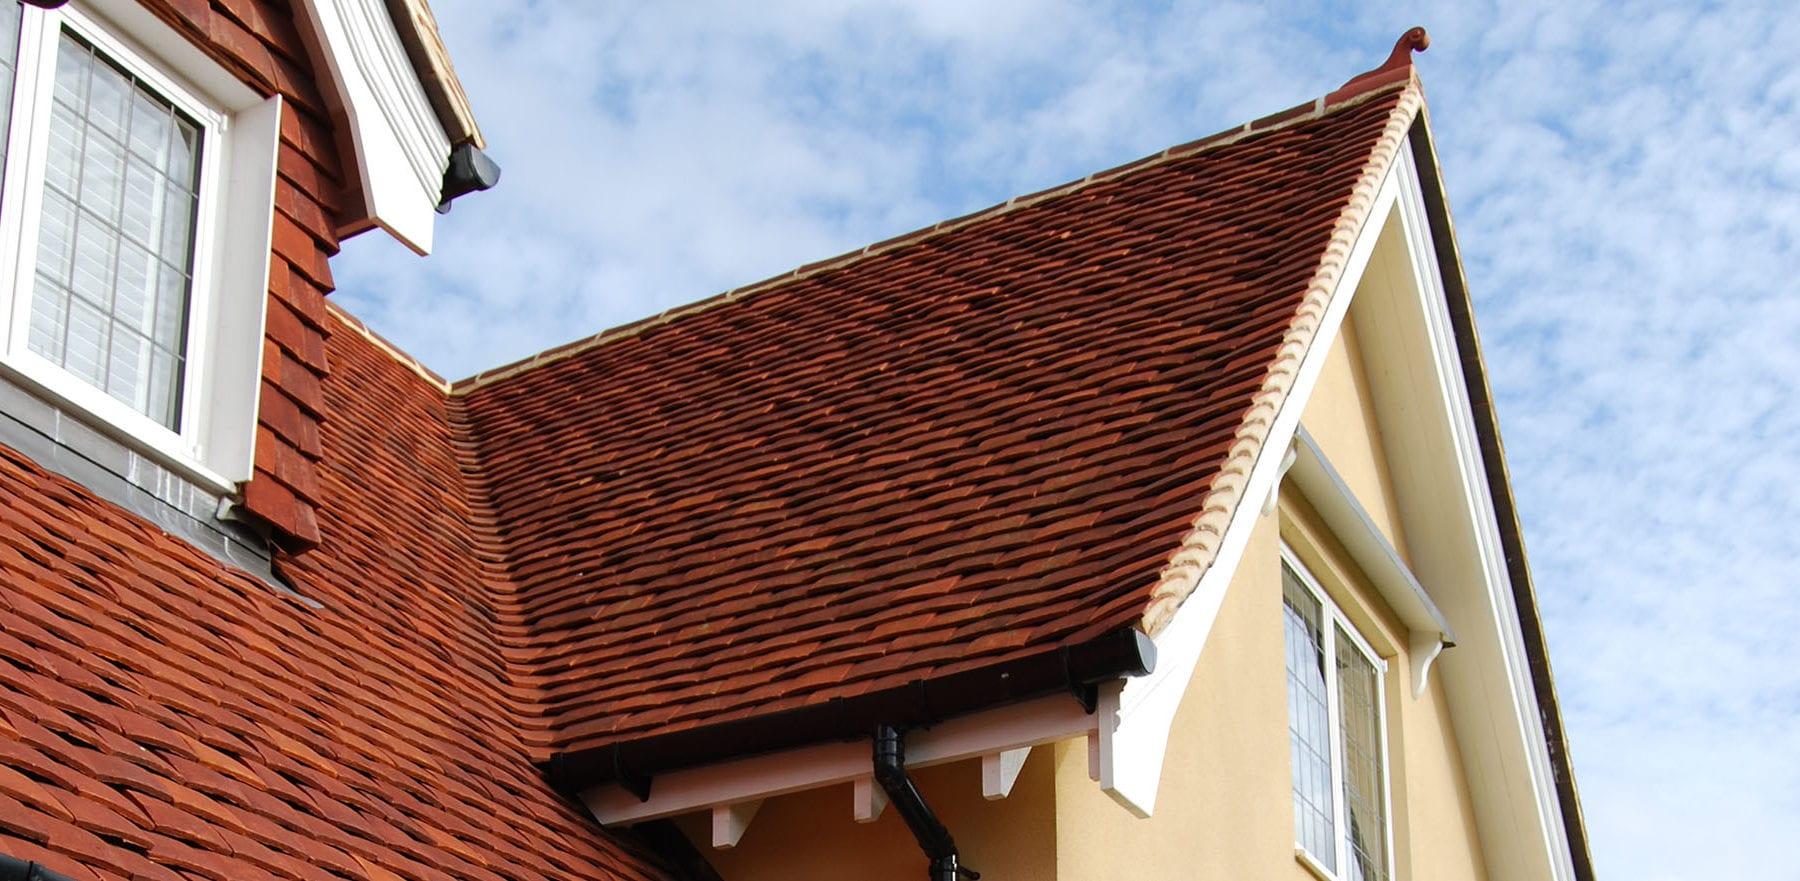 Lifestiles - Handmade Red Clay Roof Tiles - Rudley Oaks, England 4